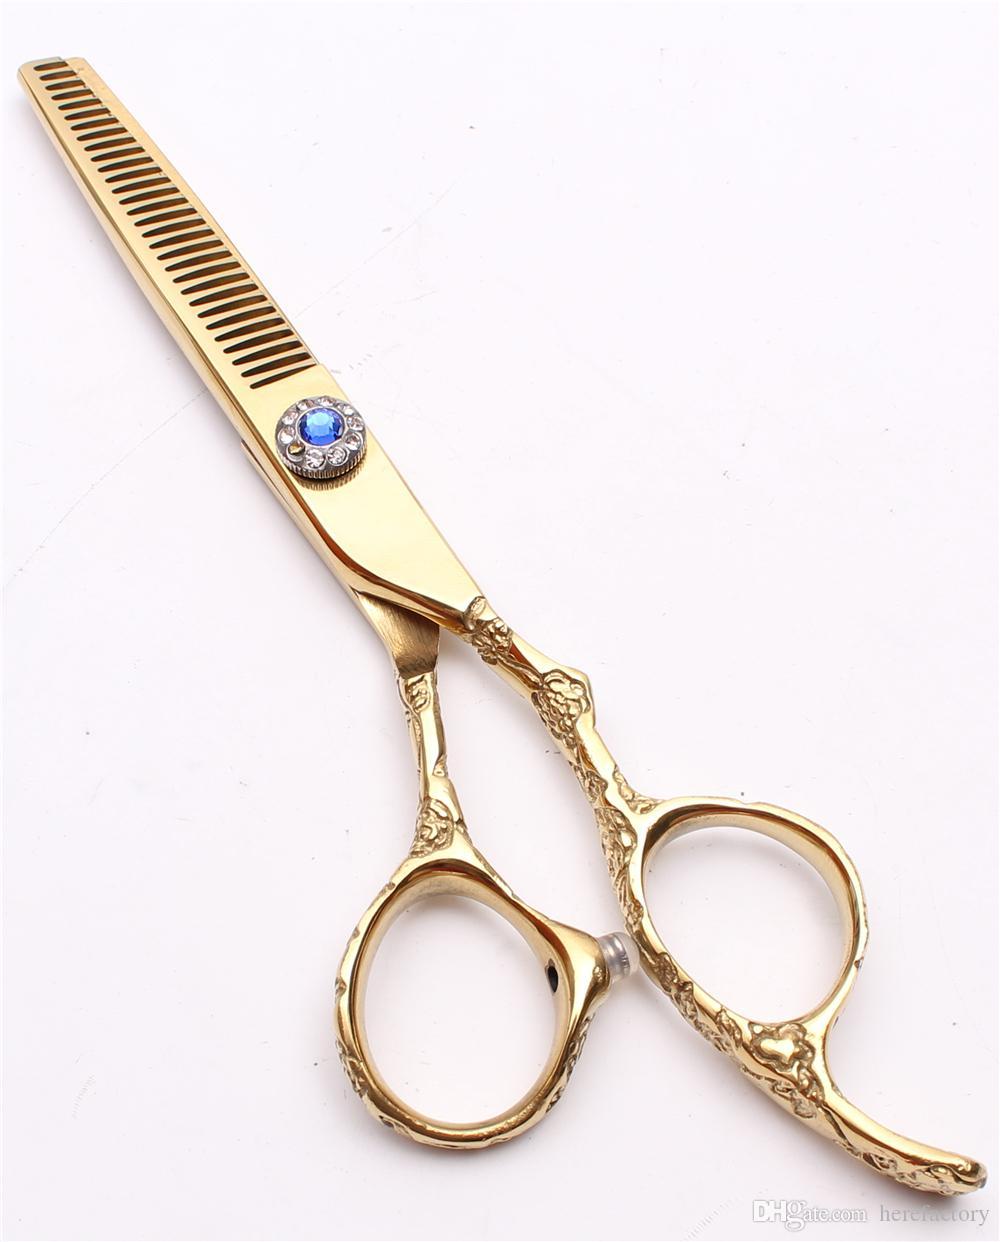 "C9002 6"" 440C Customize Logo Laser Gold Professional Human Hair Scissors Barbers' Hairdressing Scissors Cutting Thinning Shears Plum Handle"